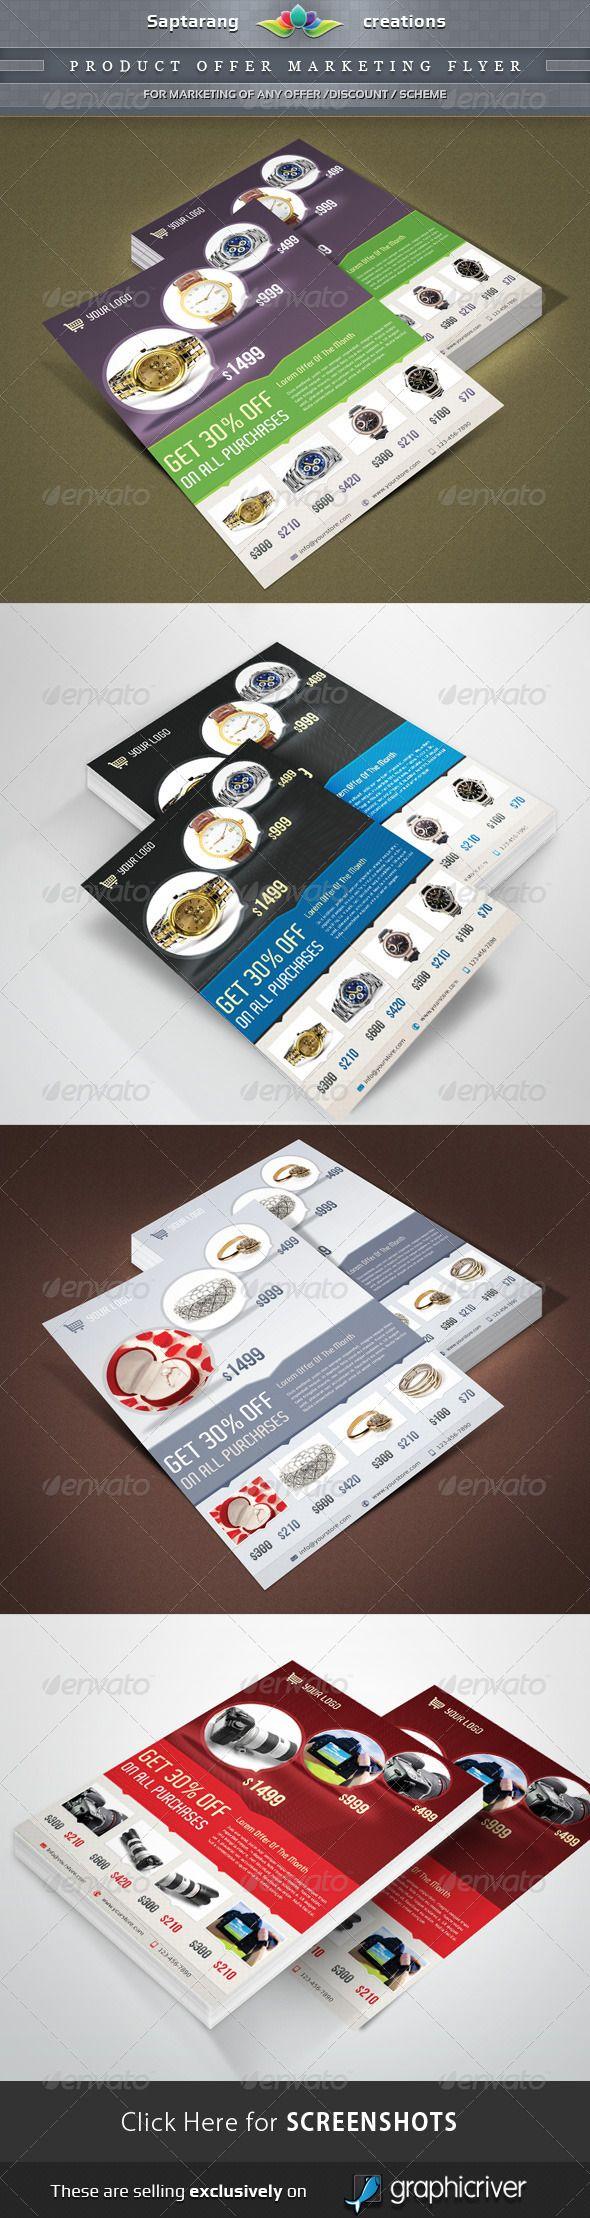 Product Offer Marketing Flyer Marketing Flyer Pinterest